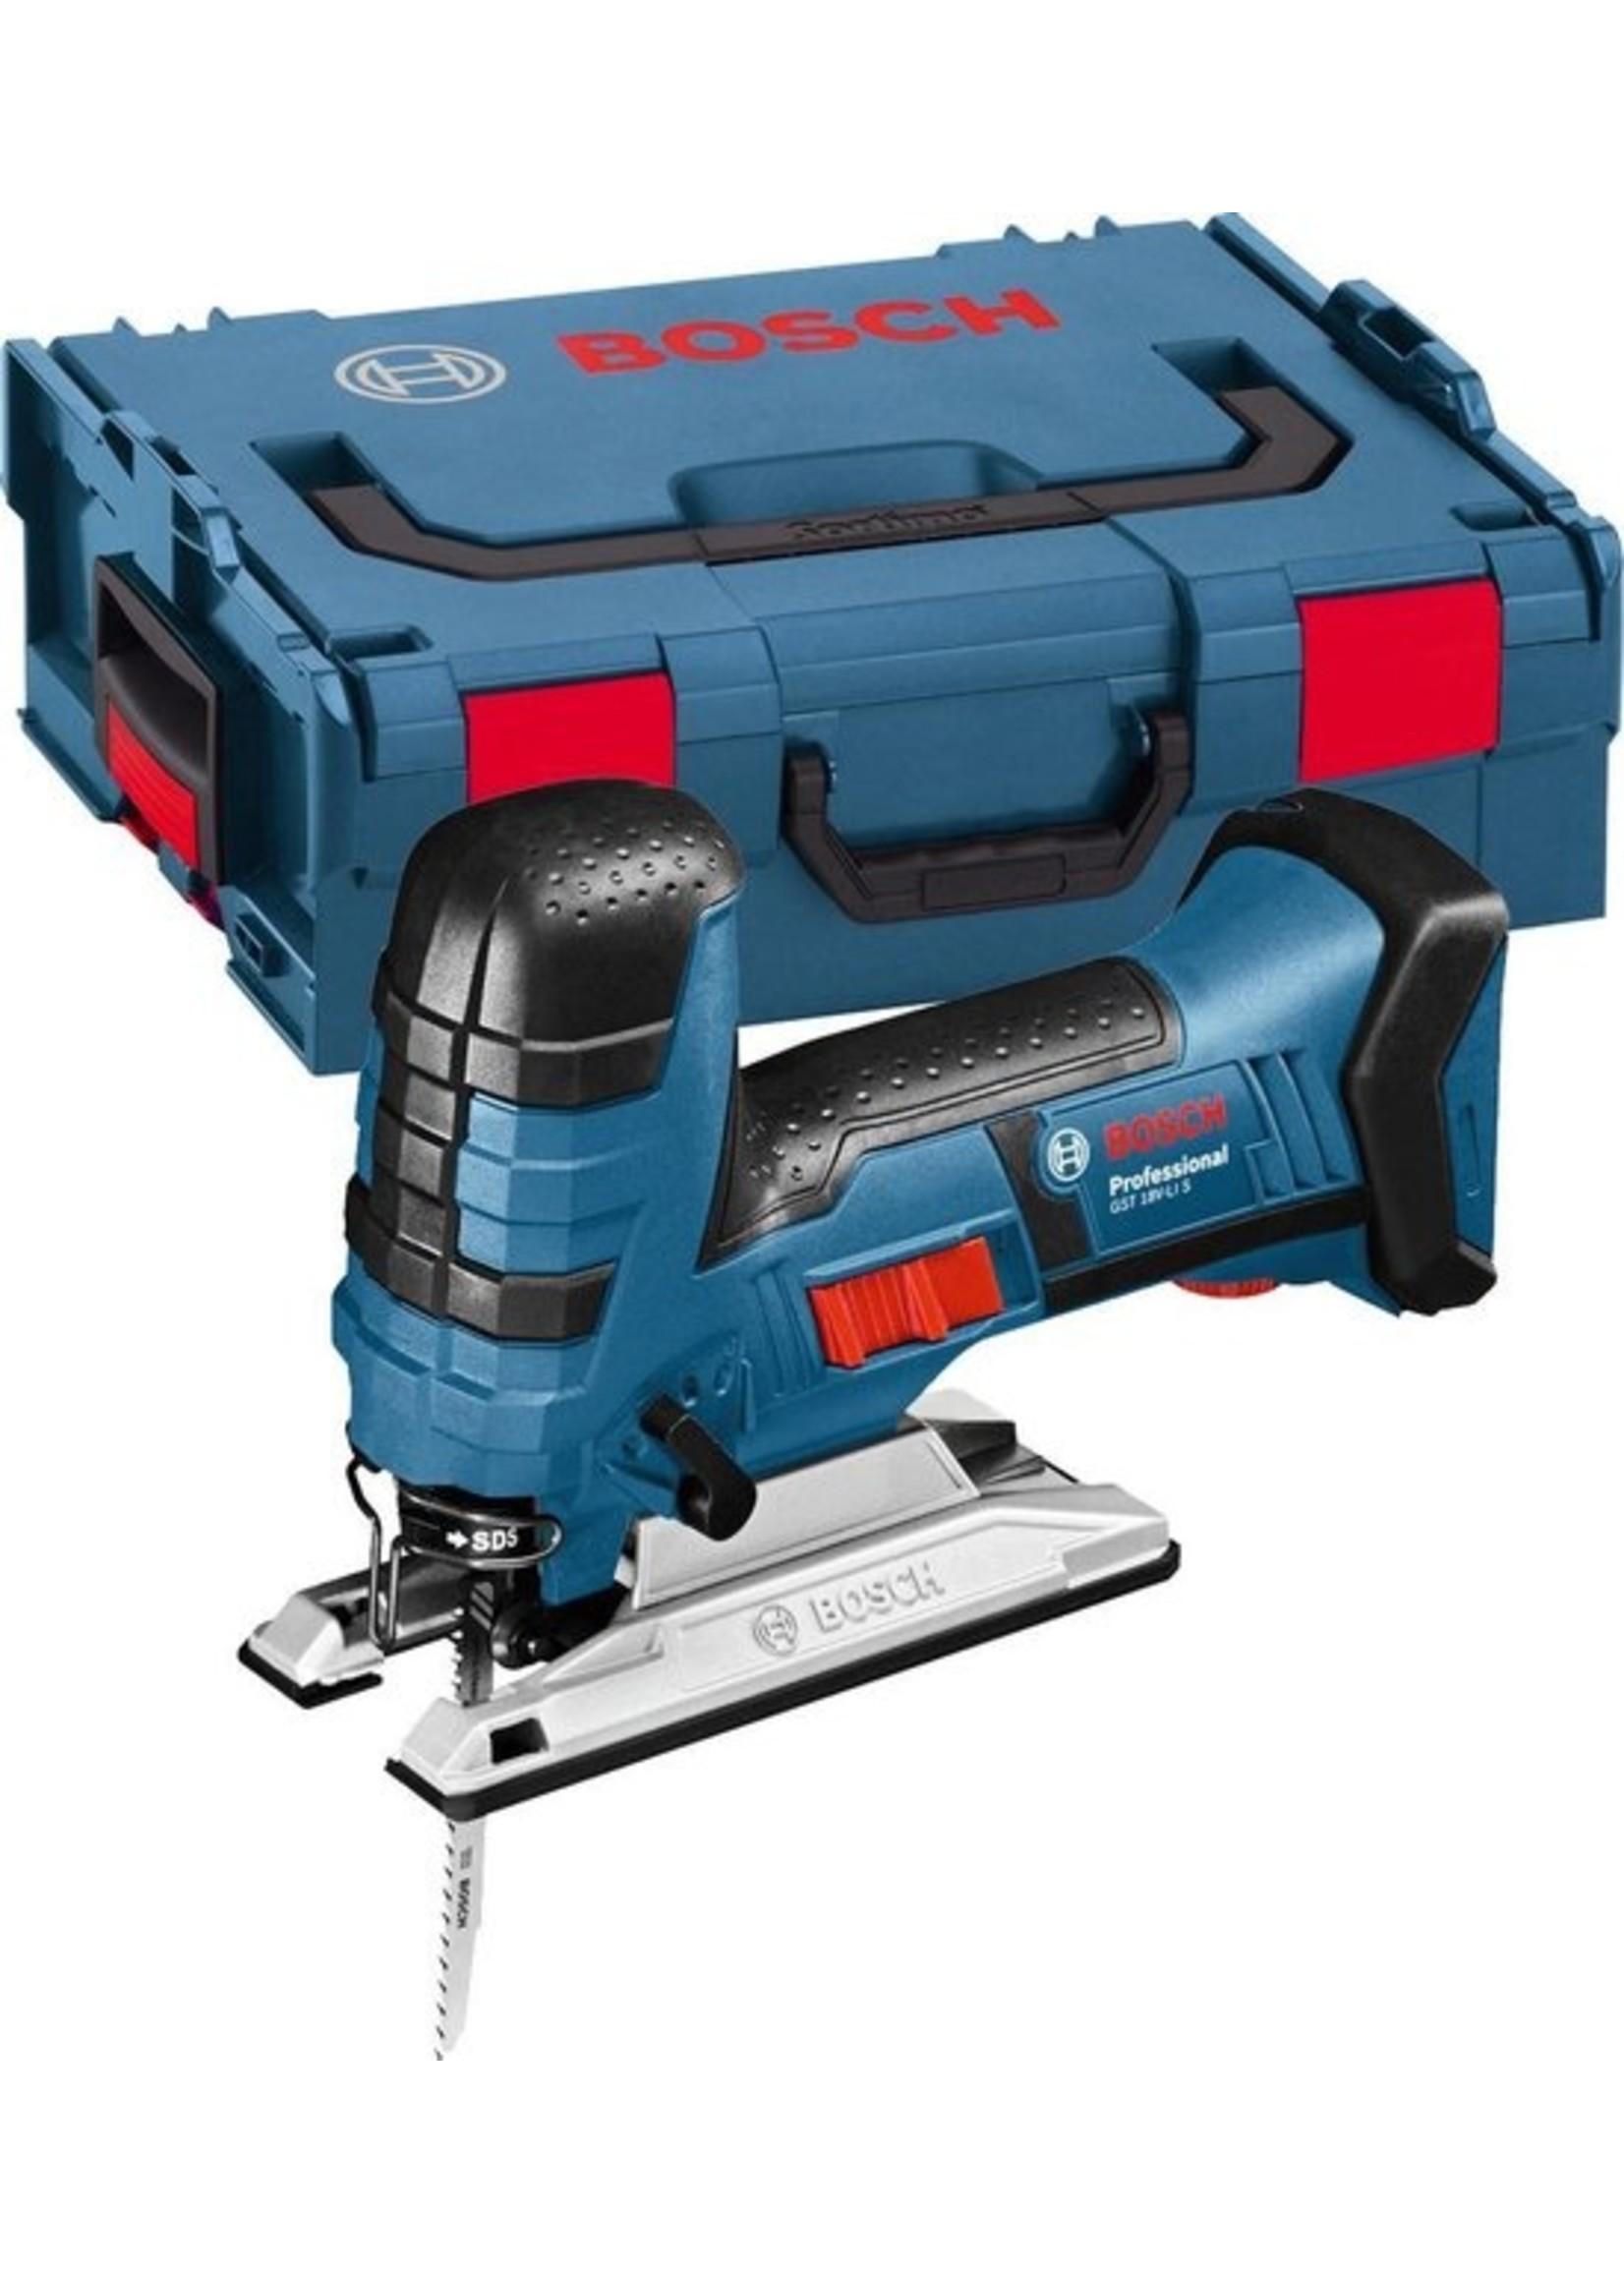 Bosch Bosch Professional GST 18 V-LI S - Accu decoupeerzaag - Met L-BOXX - Losse Body (geleverd zonder accu en lader) koopjeshoek